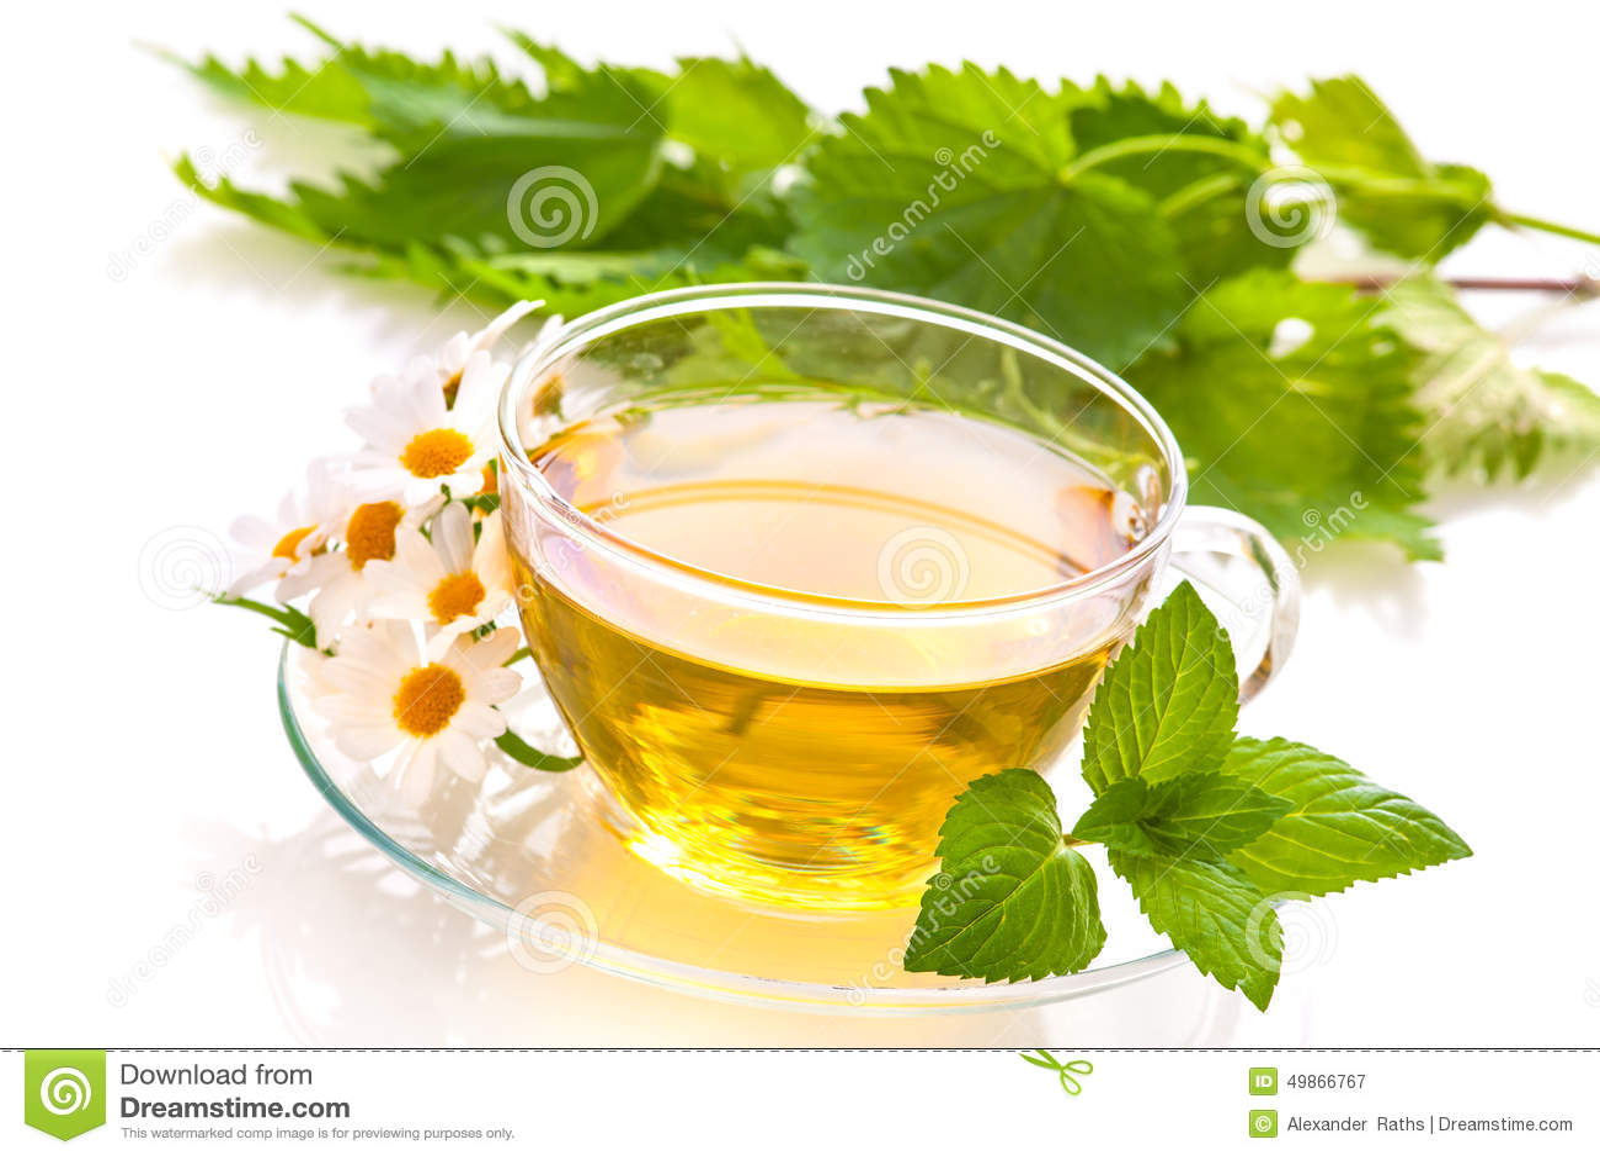 Arvense杯子木贼属植物重点玻璃草本马尾注入naturopathy有选择性的茶